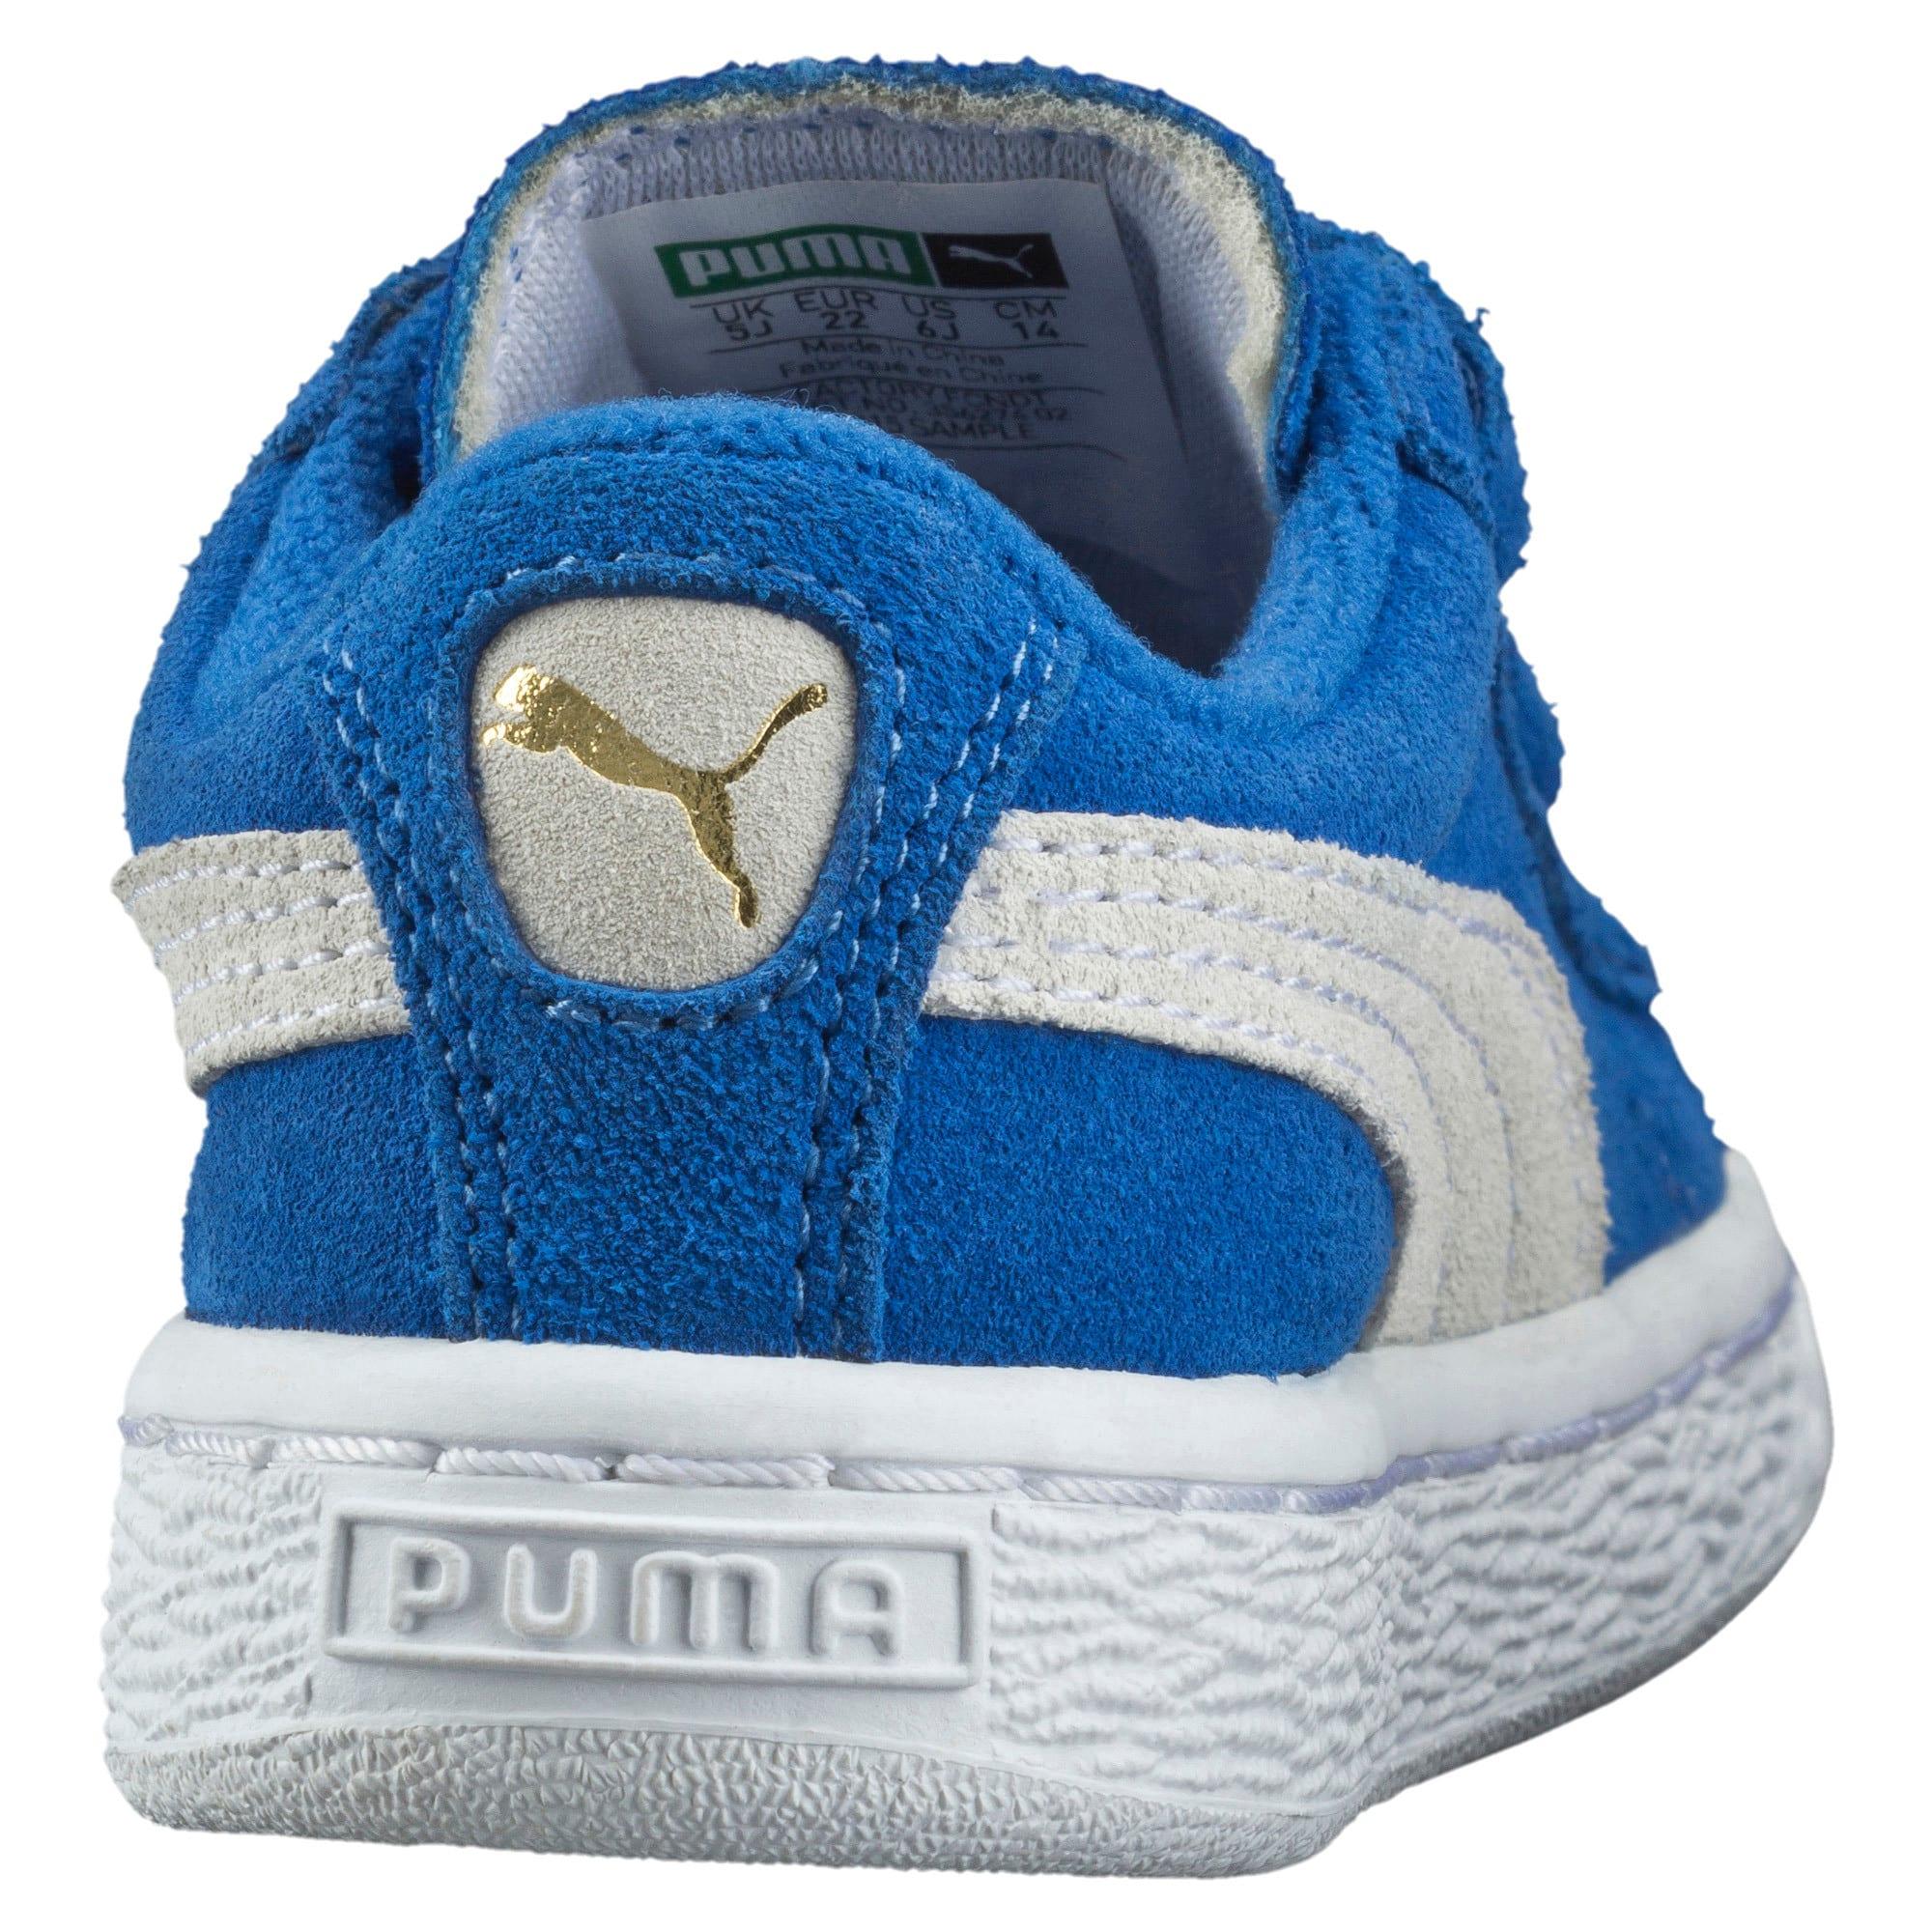 Thumbnail 3 of キッズ スウェード 2ストラップ PS (17-21cm), Snorkel Blue-Puma White, medium-JPN